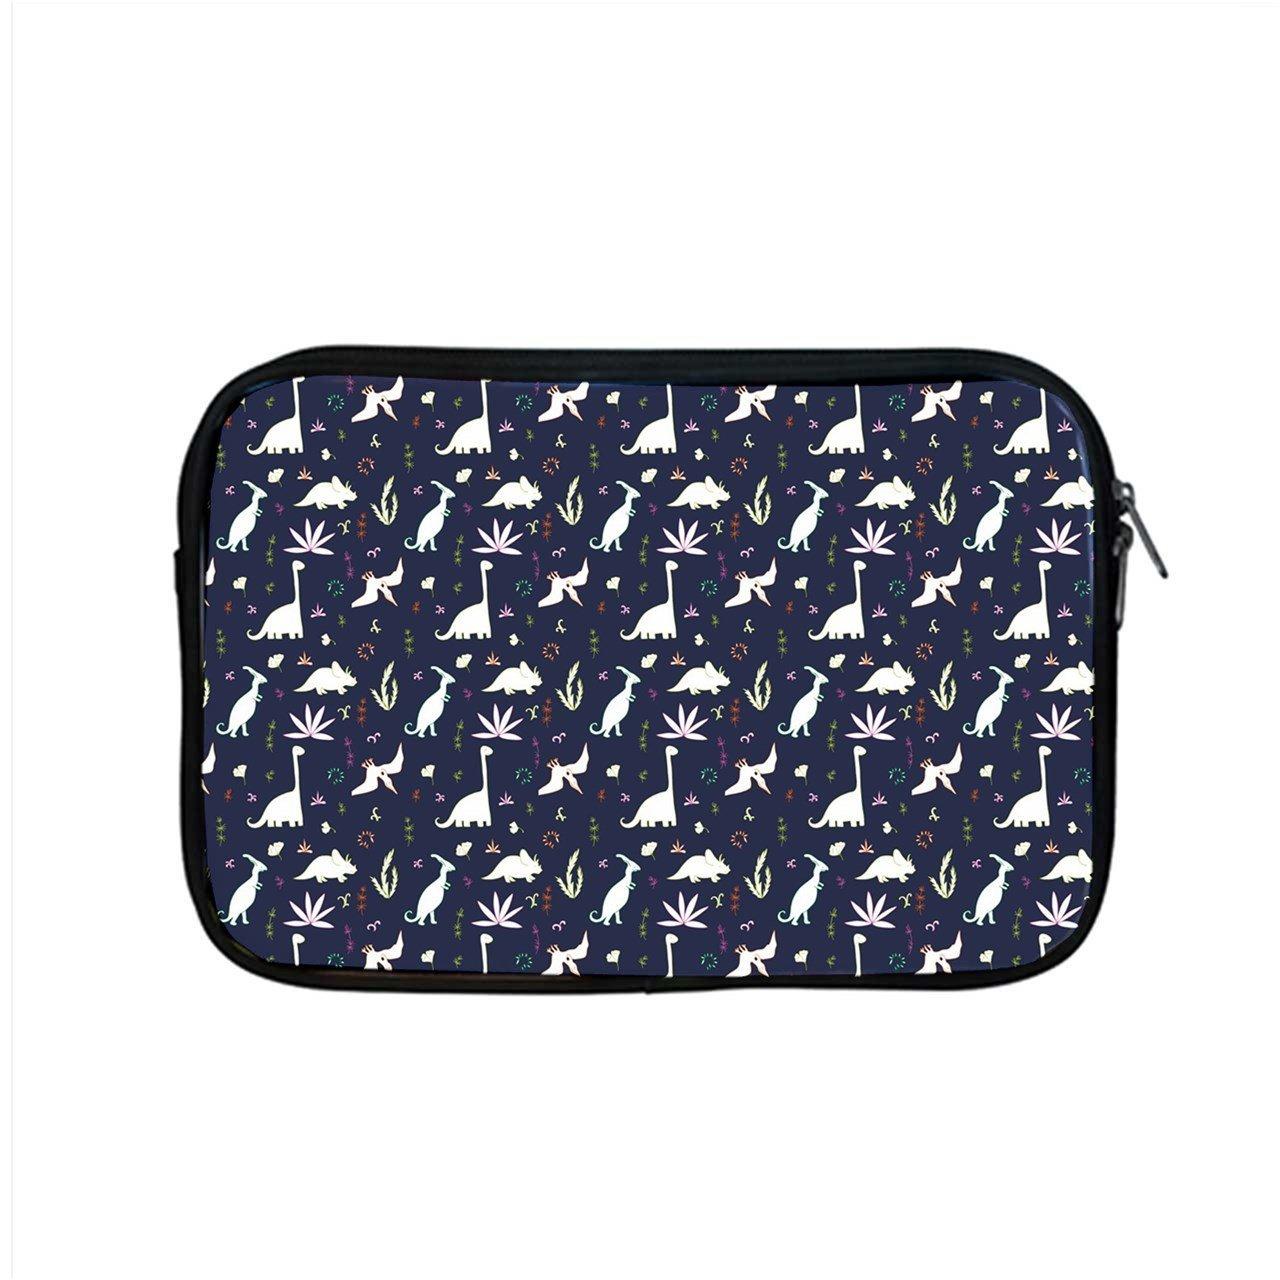 "Leaves Dinosaurs Apple MACBOOK Pro 15"" Zipper Case"